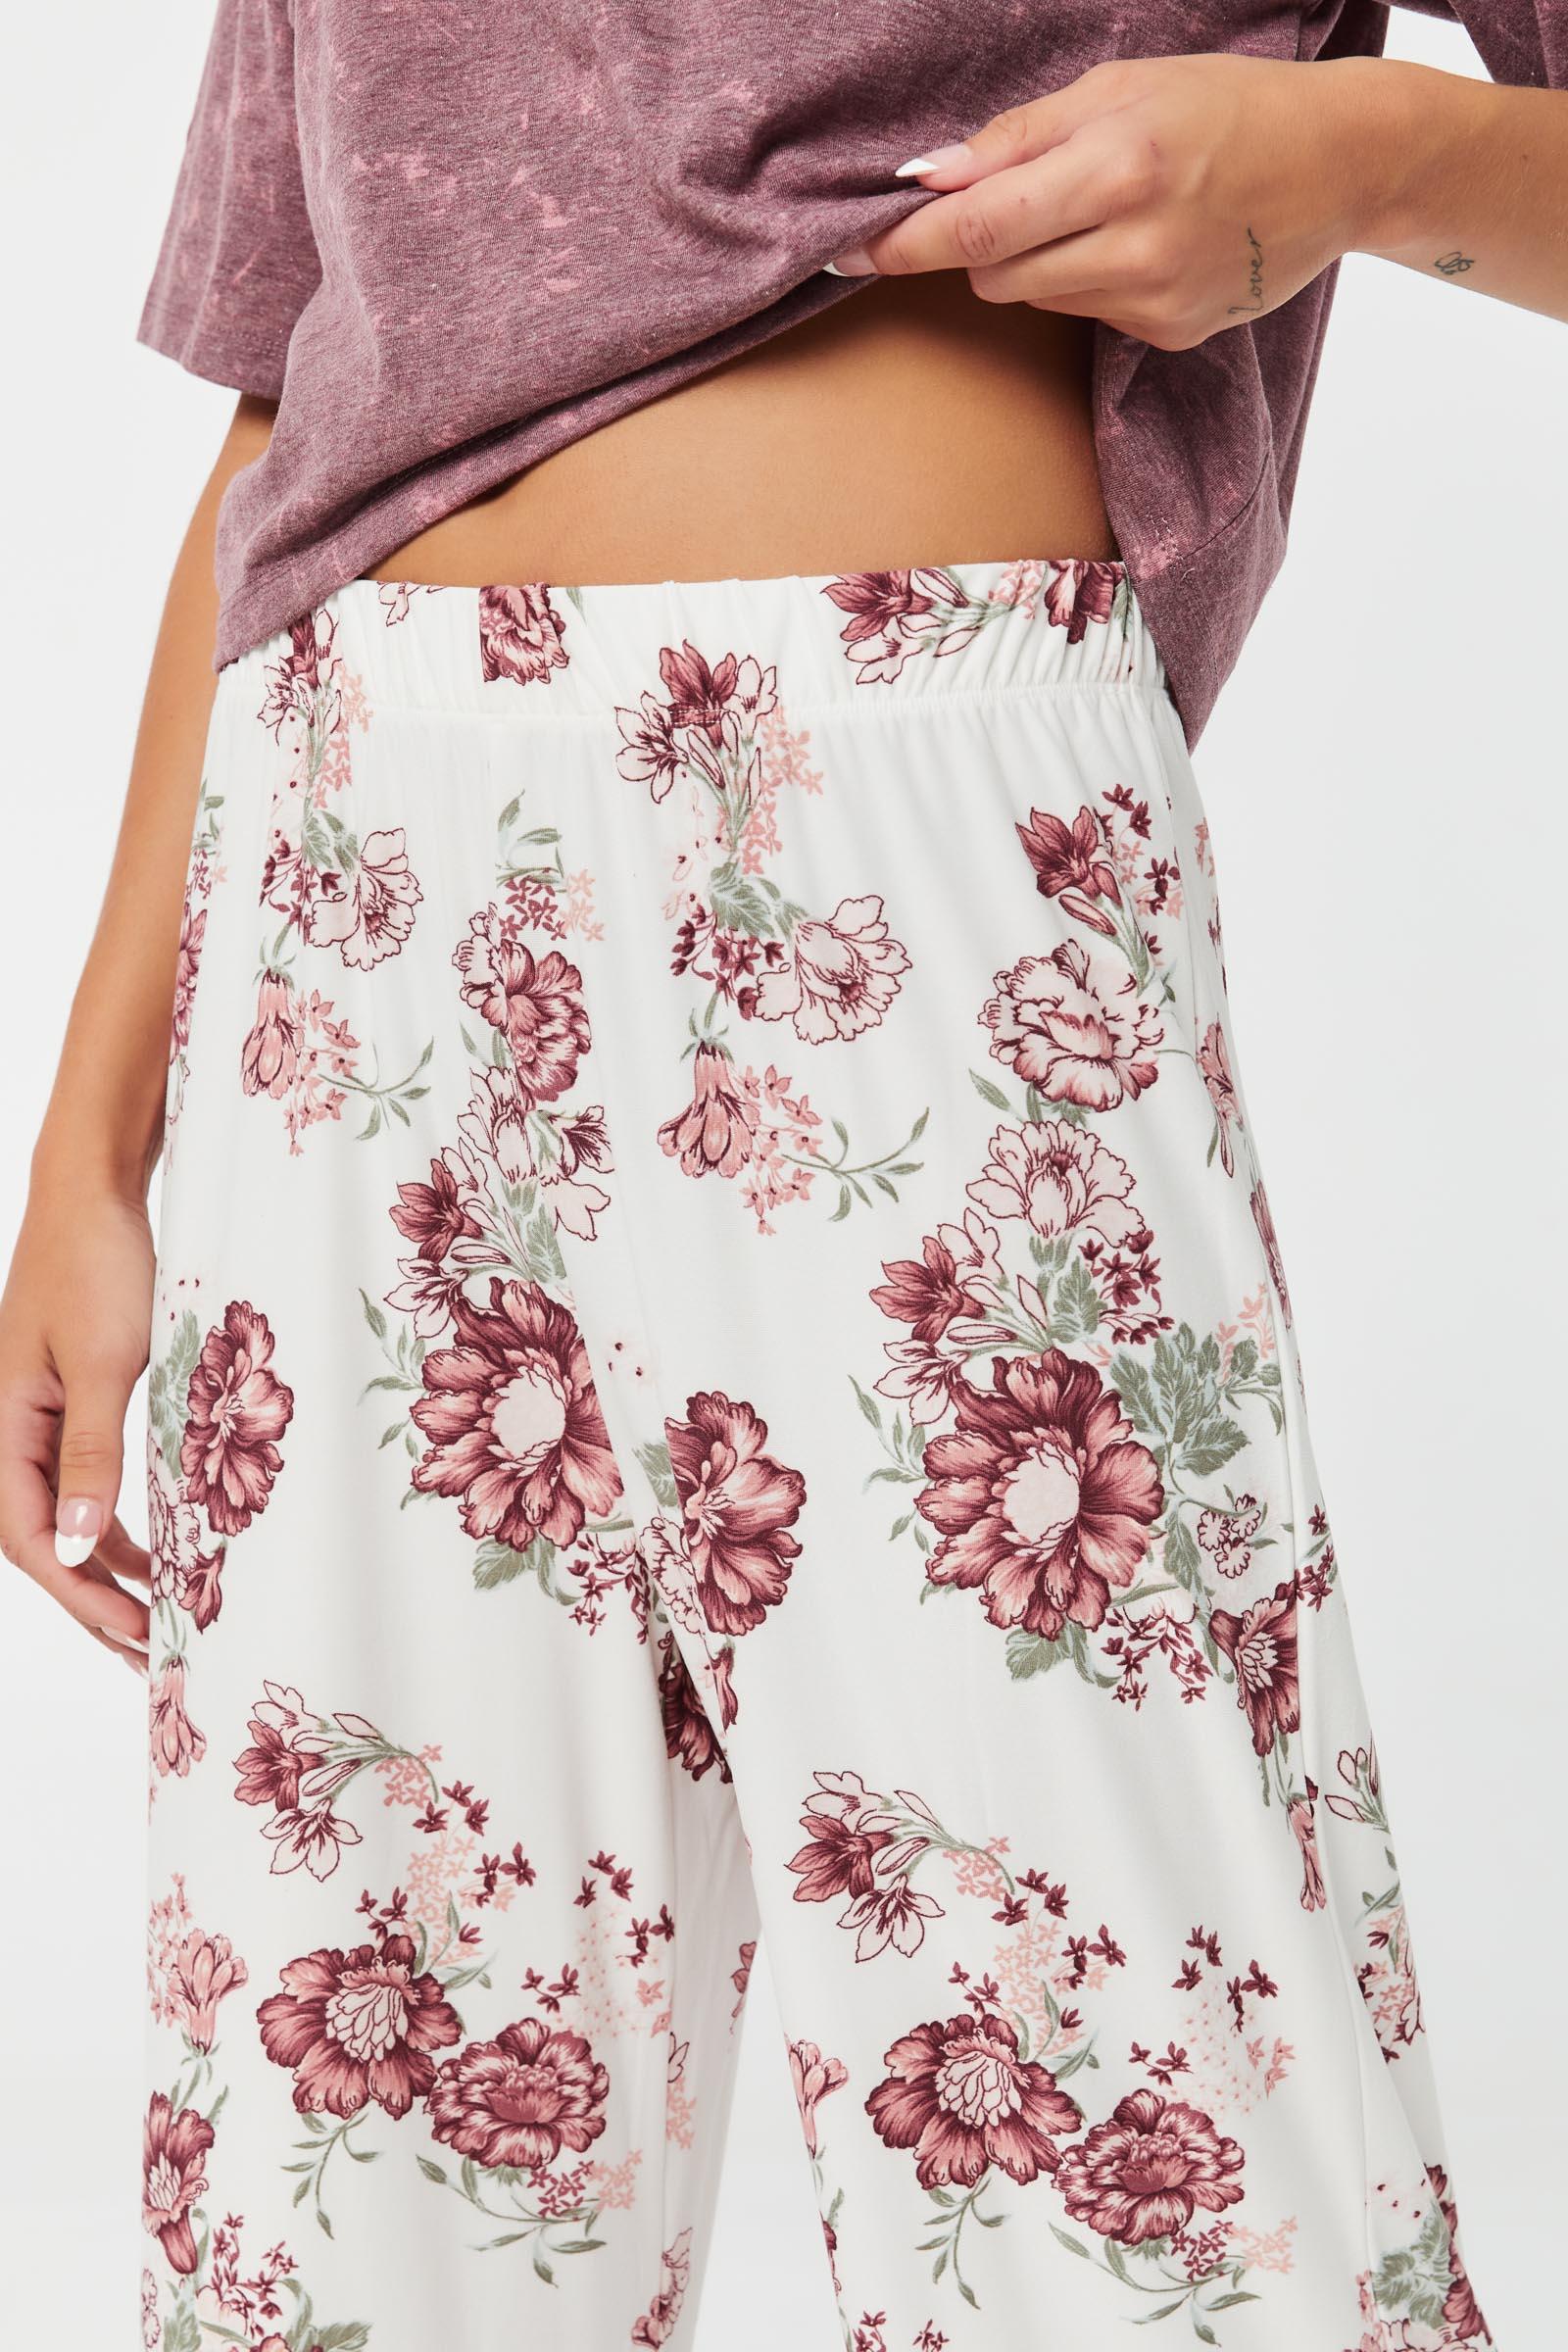 Pantalon pyjama évasé détente fleuri